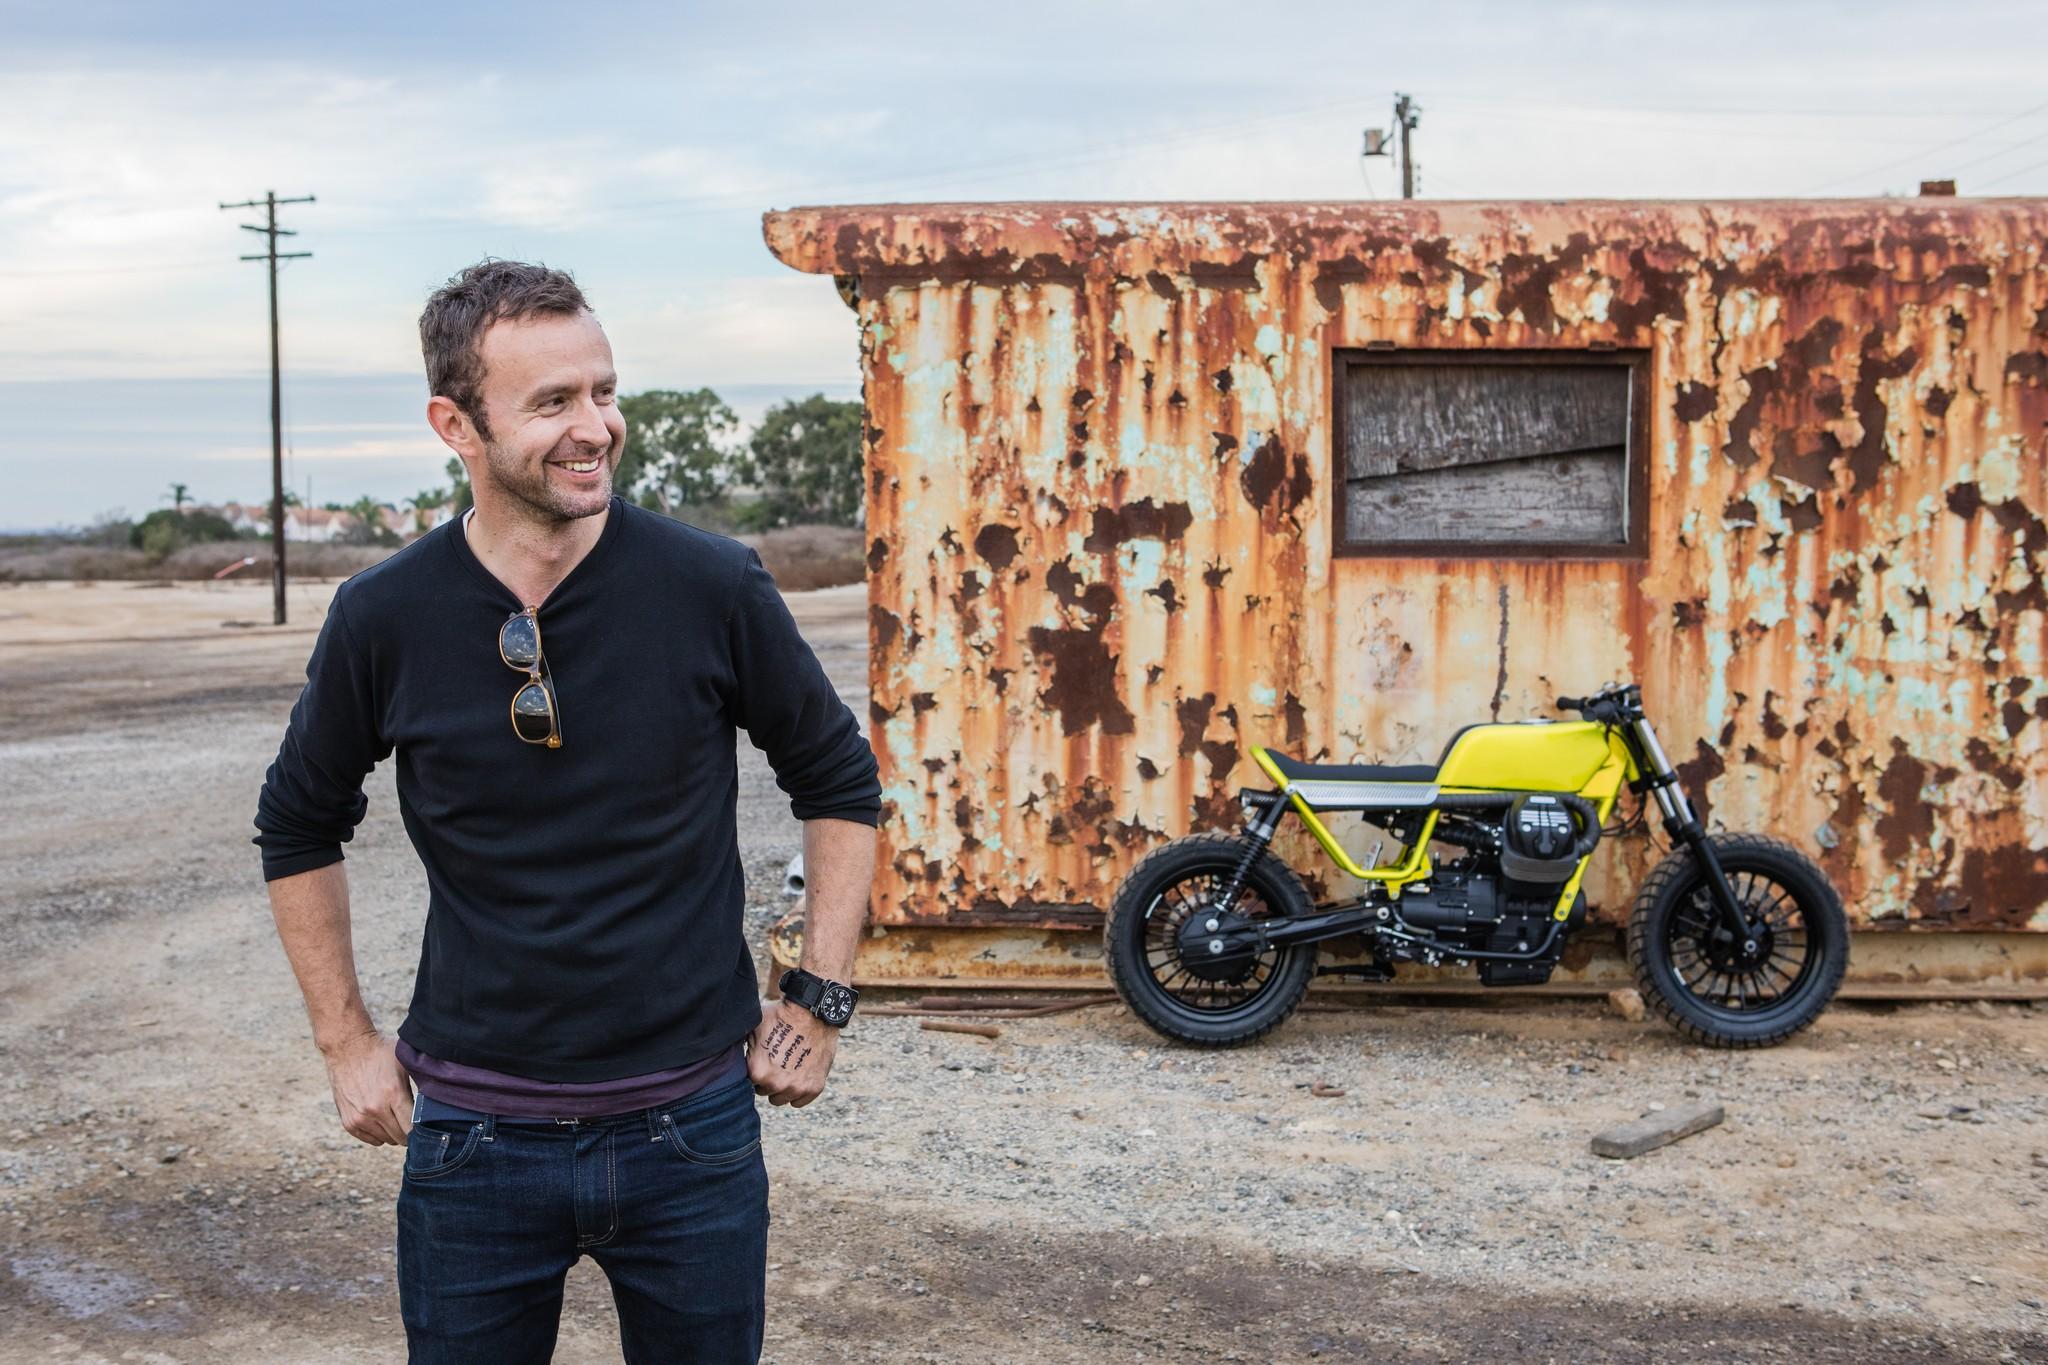 Hugo Eccles from San Francisco's Untitled Motorcycles and his custom Moto Guzzi